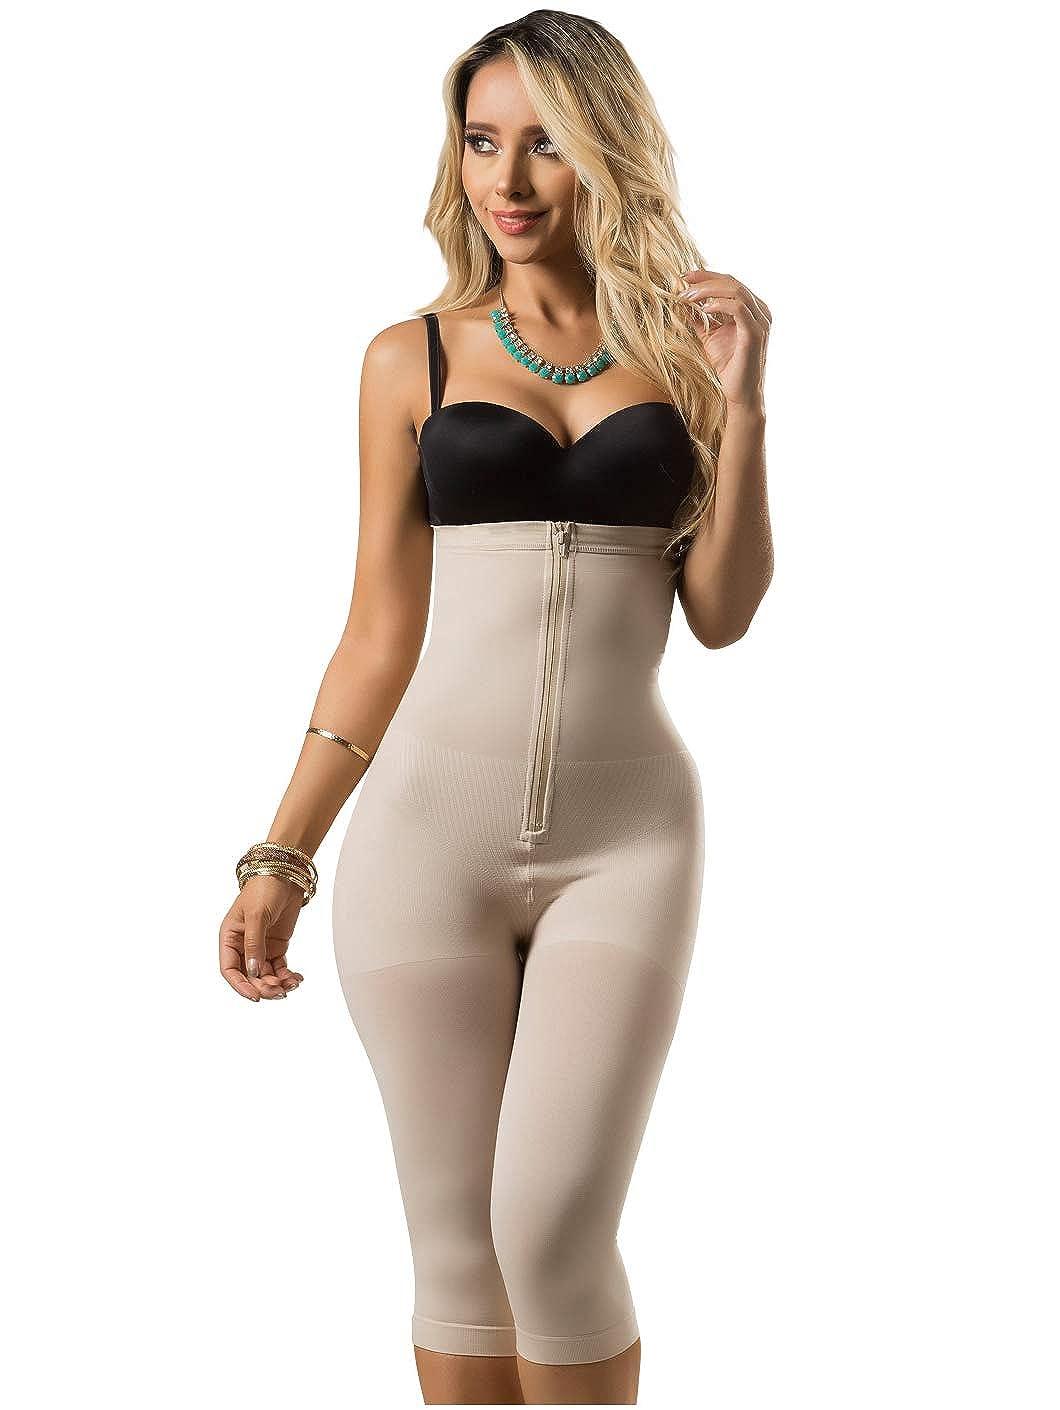 ba4e369f38 Rose 21998 Strapless Shapewear Full Body Shaper for Women Fajas Colombianas  Black at Amazon Women s Clothing store